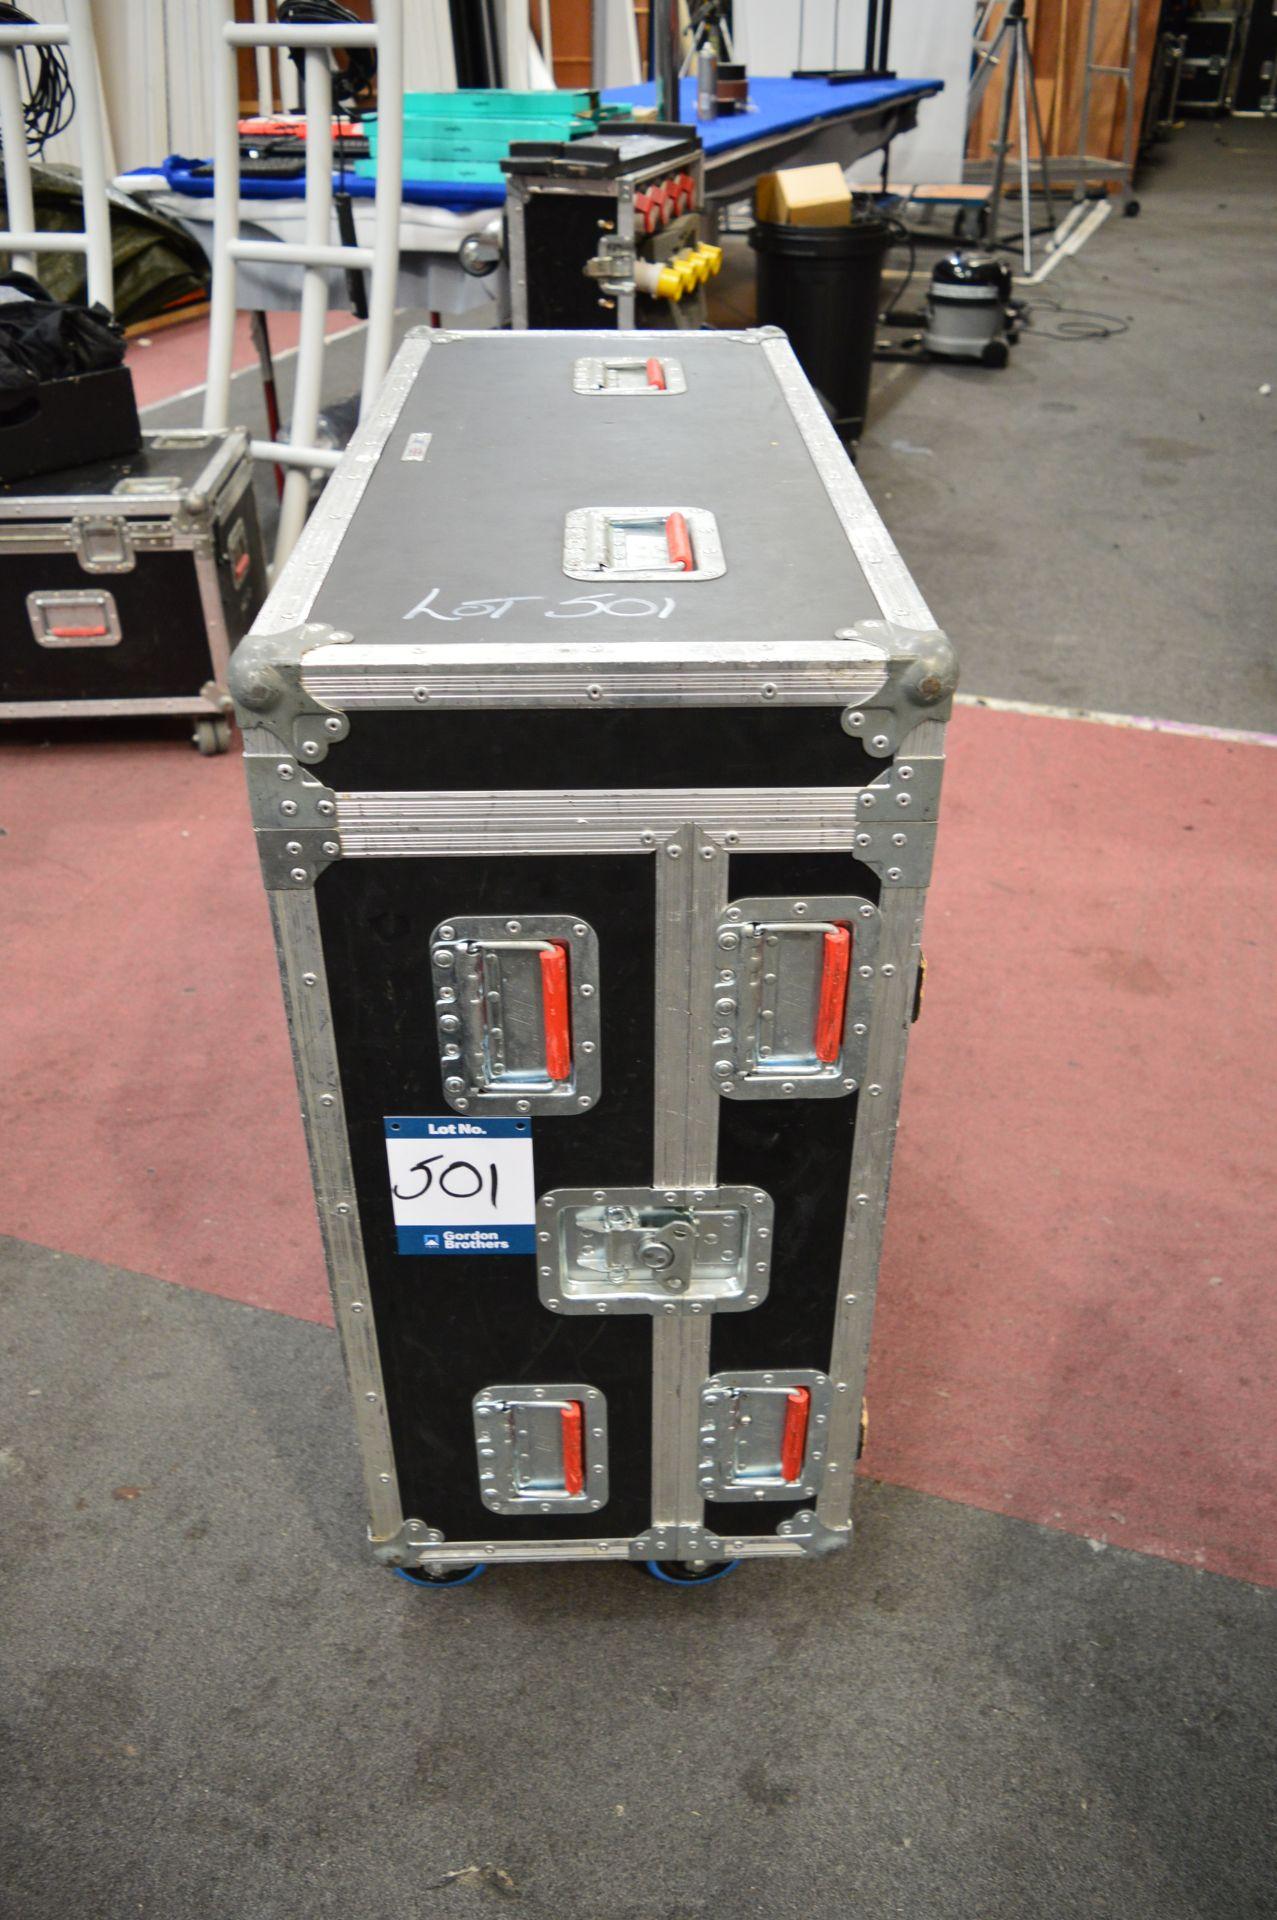 Lot 501 - Yamaha, QL5 digital mixing console, Serial No. BAV